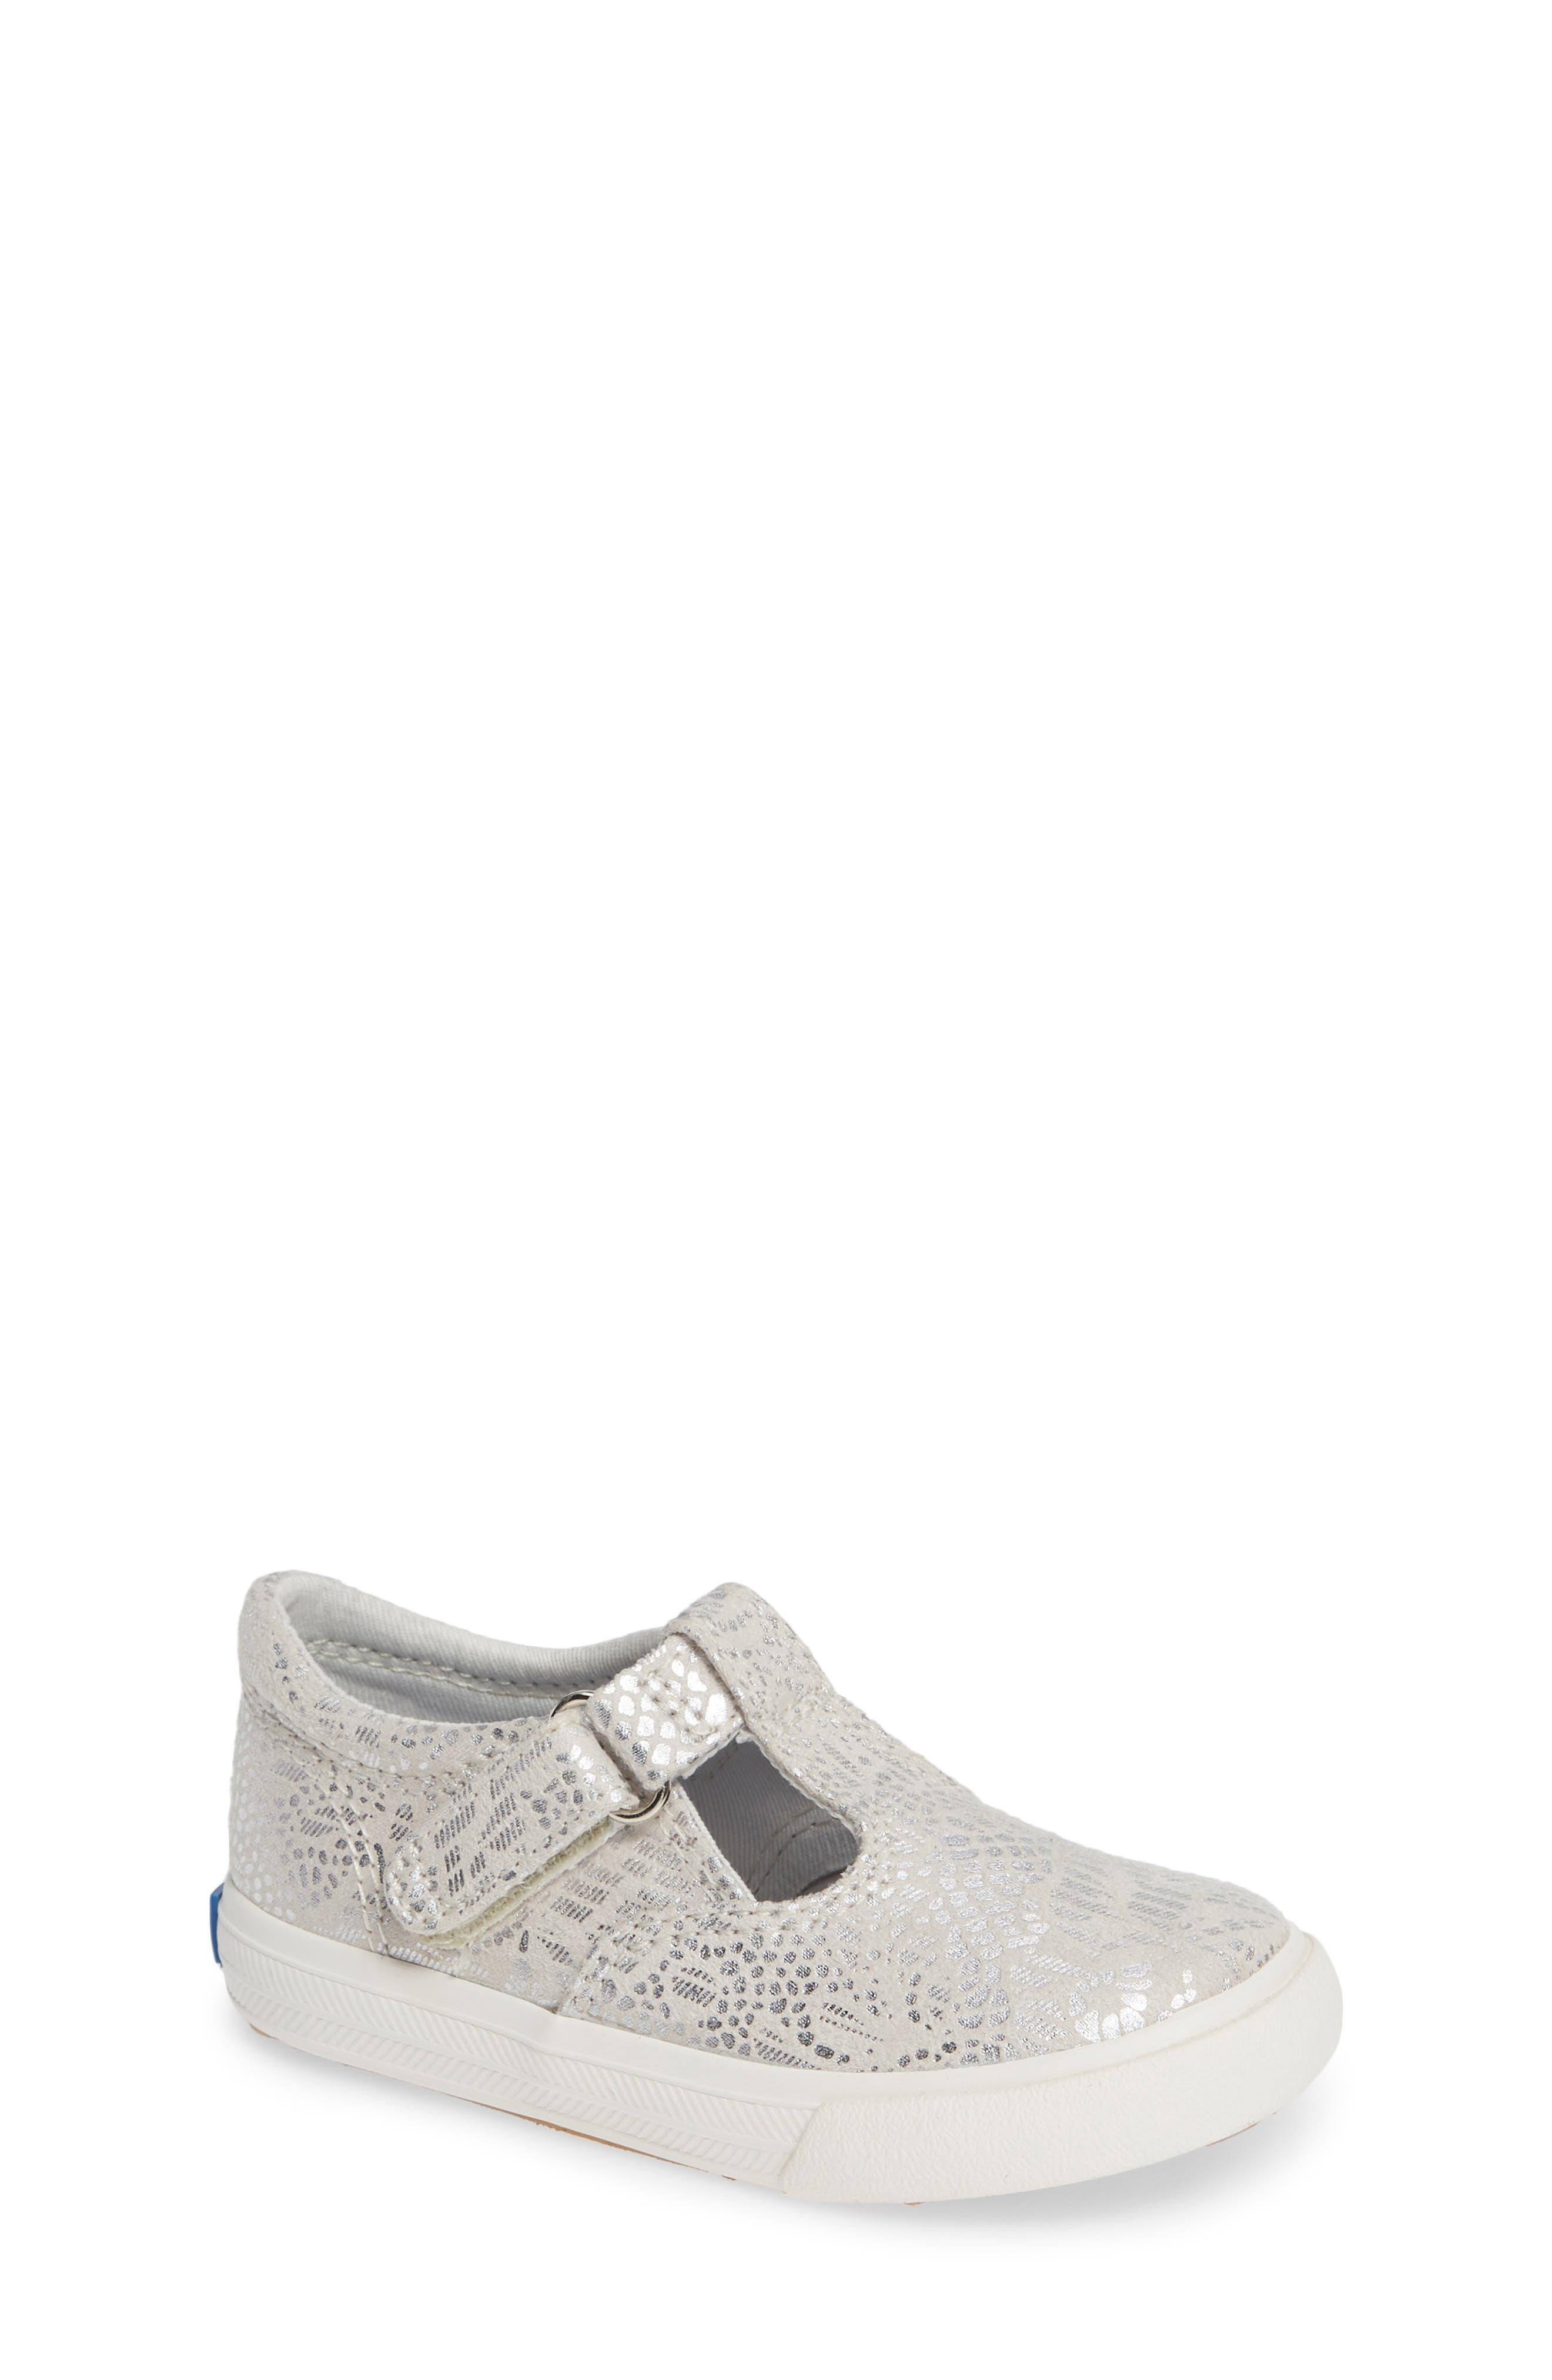 Infant Girls Keds Daphne TStrap Sneaker Size 4 M  Blue